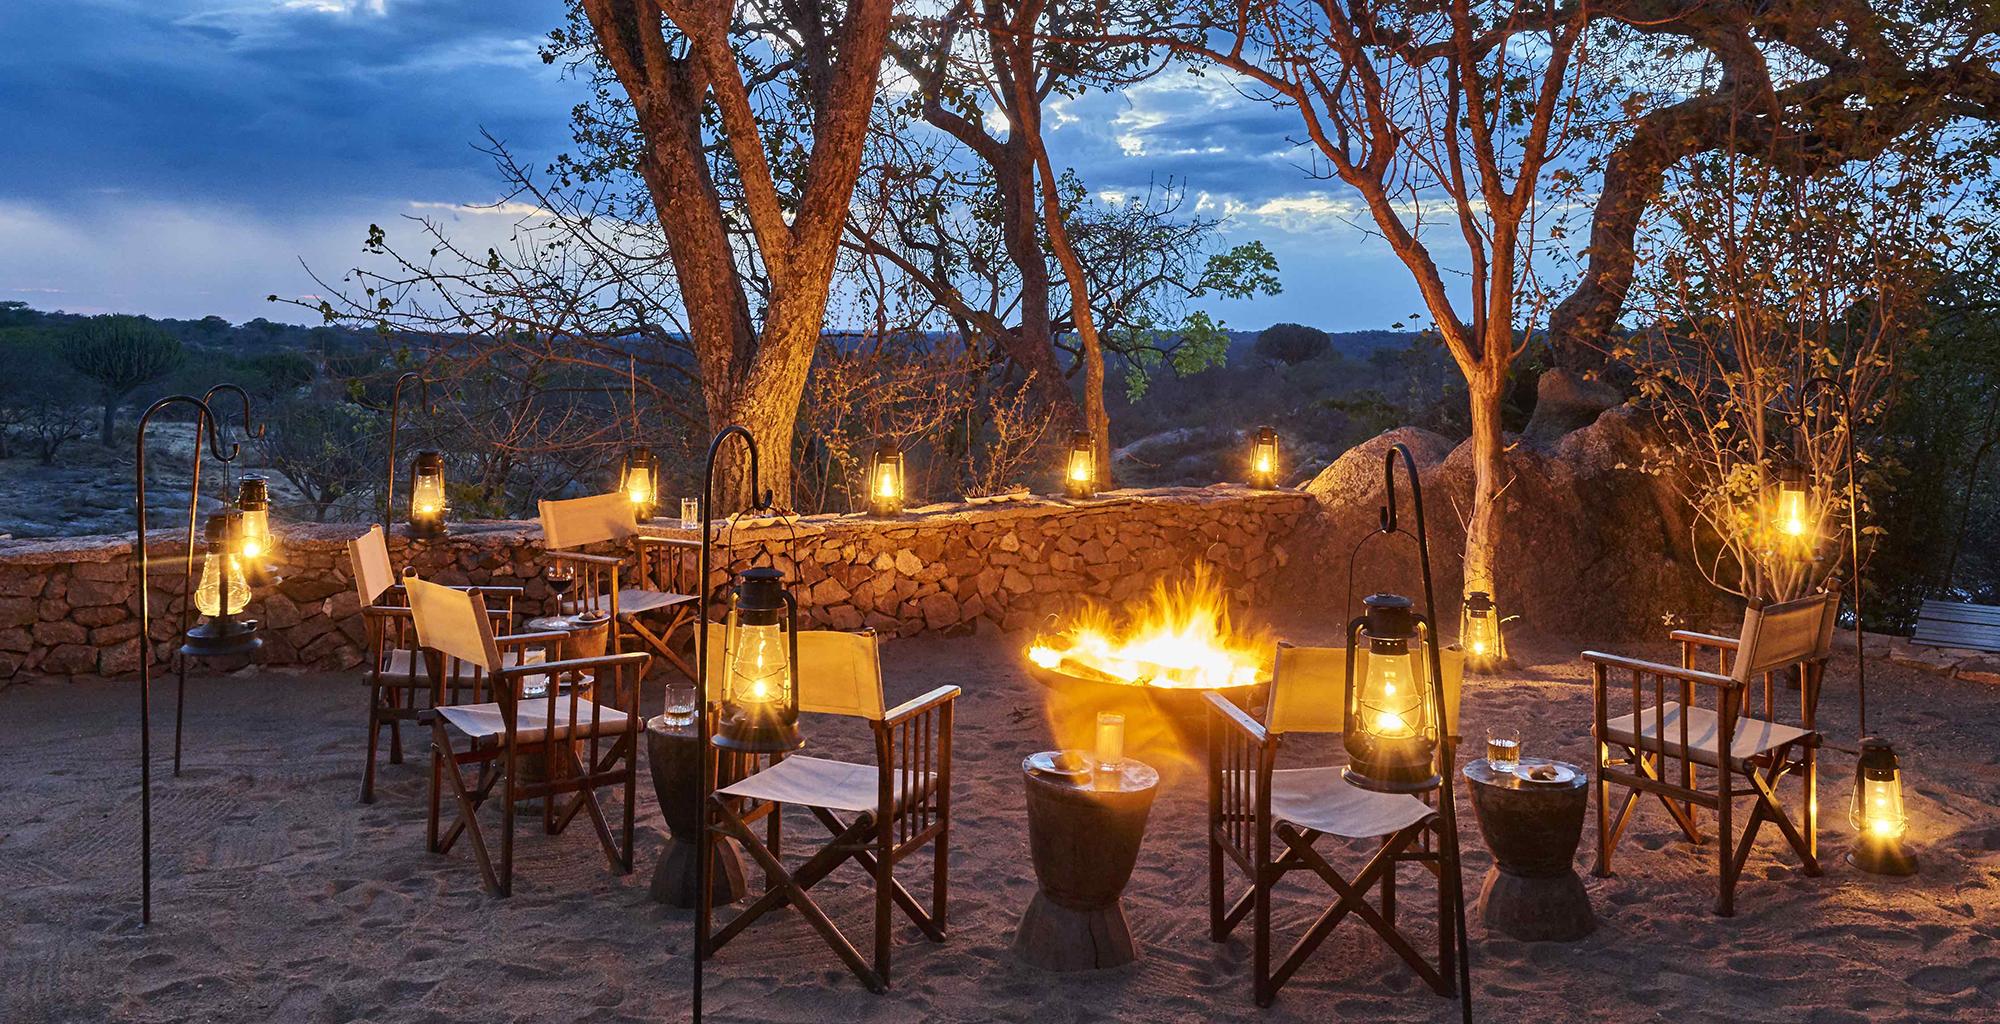 Tanzania-Mwiba-Lodge-Boma